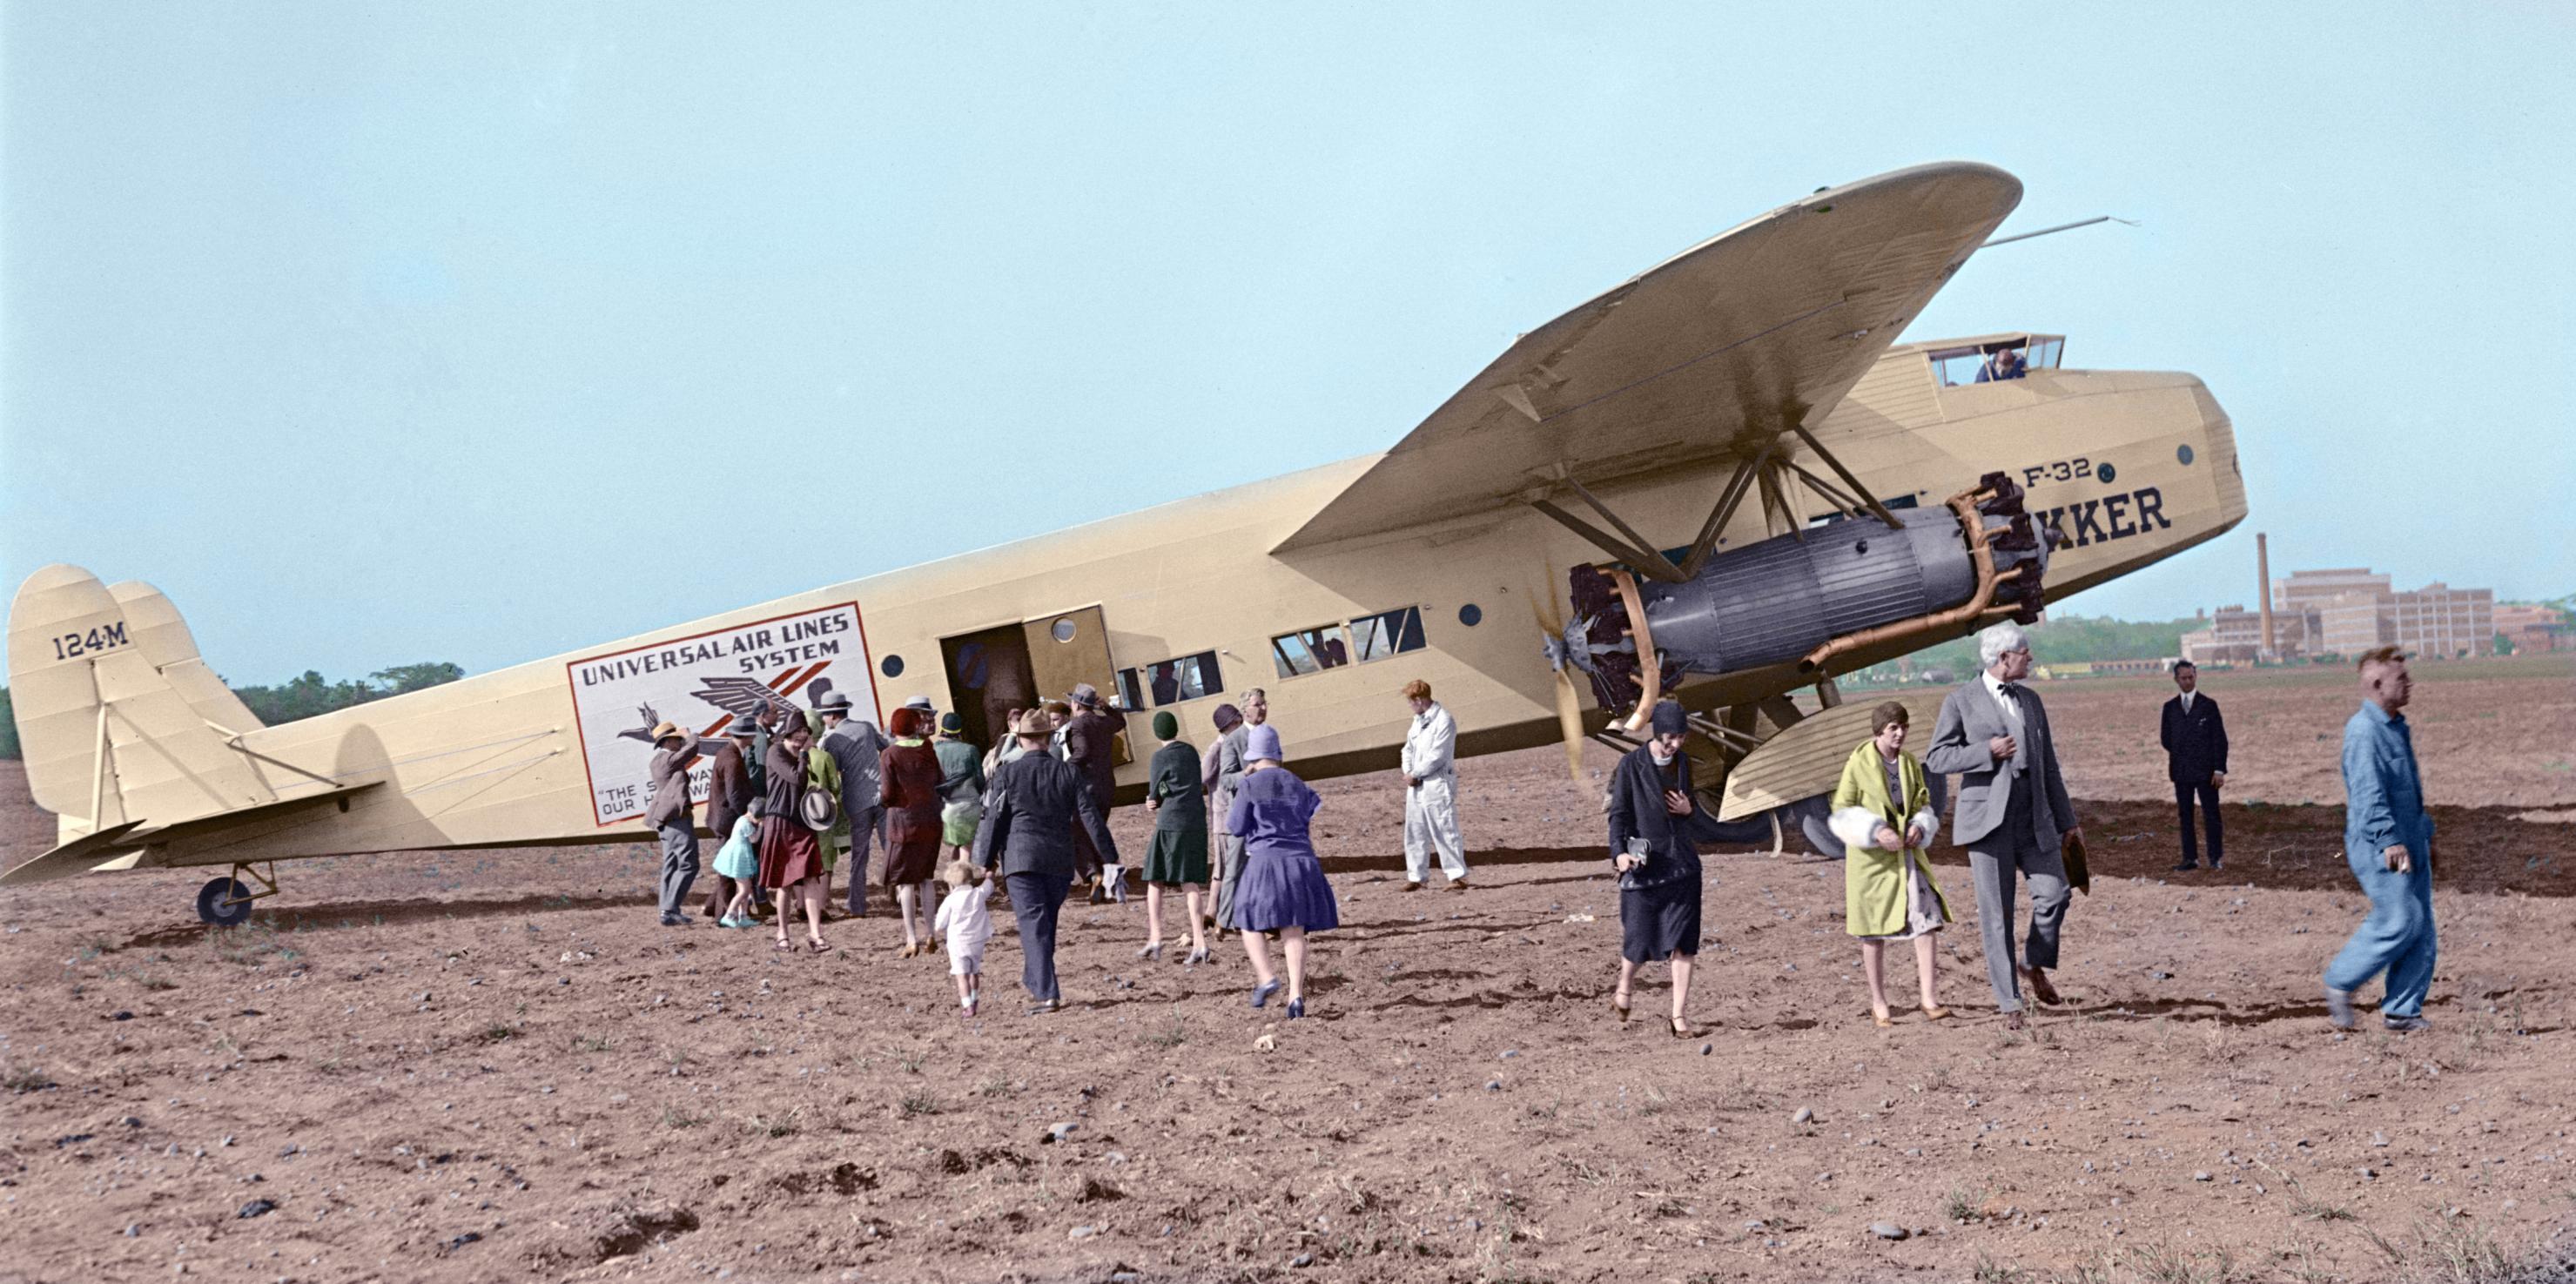 Naam: Fokker_F_32 copy.jpg Bekeken: 149 Grootte: 555,5 KB